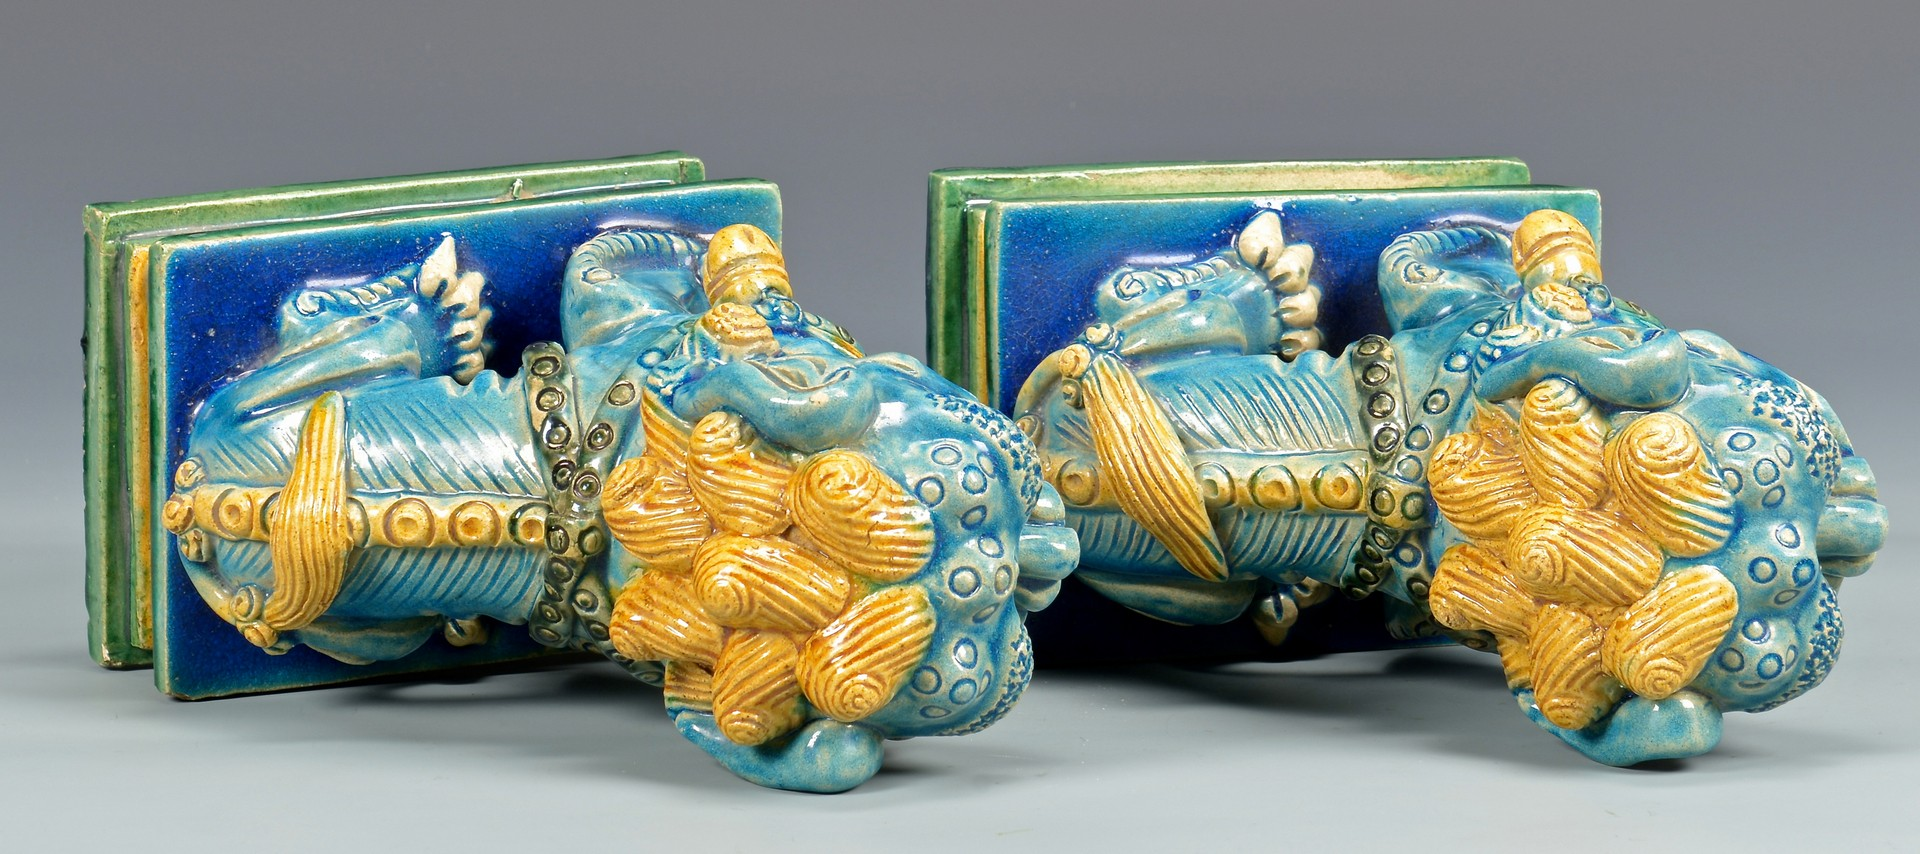 Lot 4010137: Pr. Chinese Polychrome Glazed Foo Dog Figurals